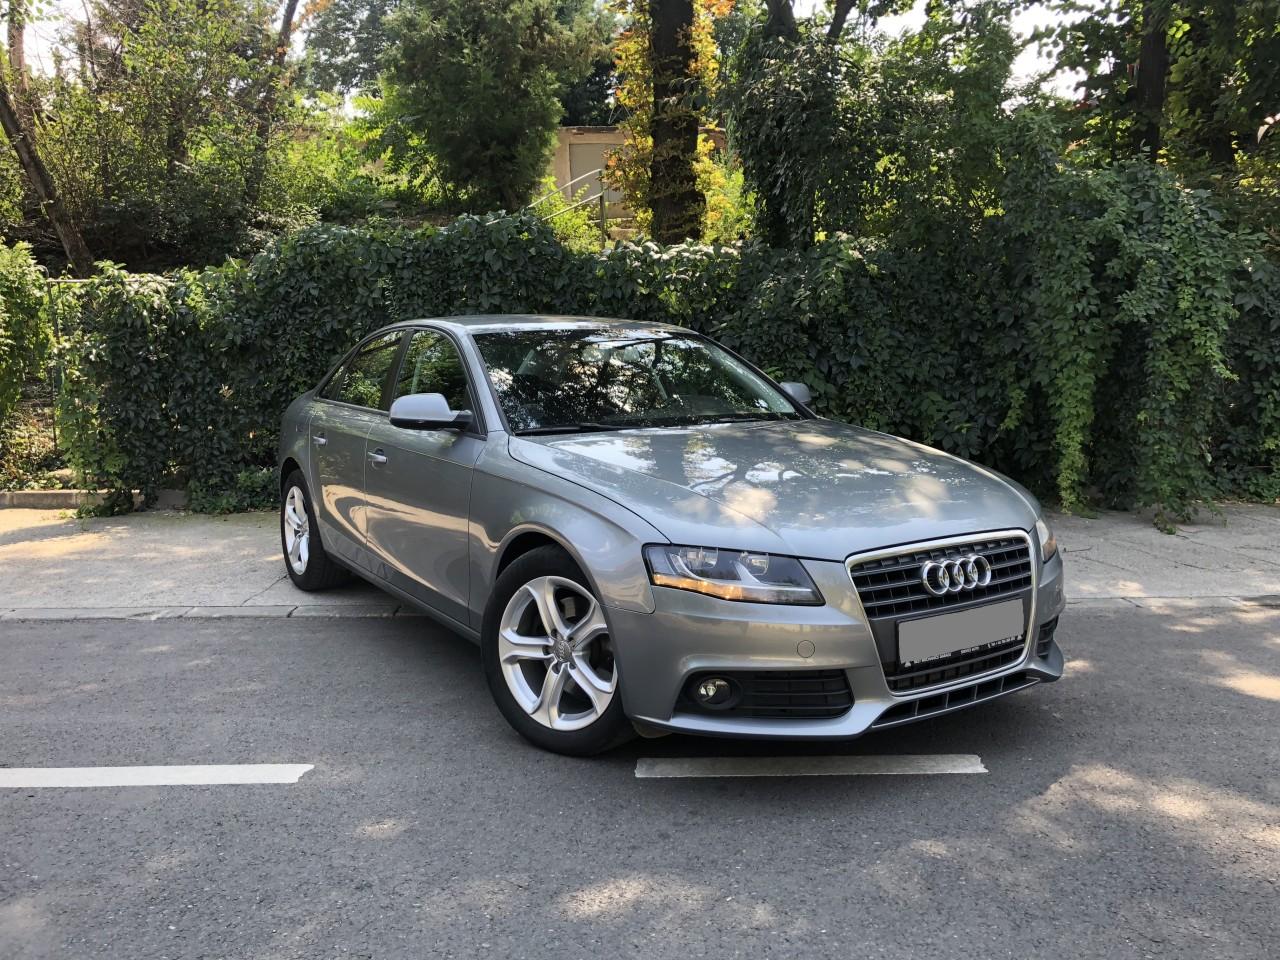 Audi A4 1.8TFSI Euro 5 2009